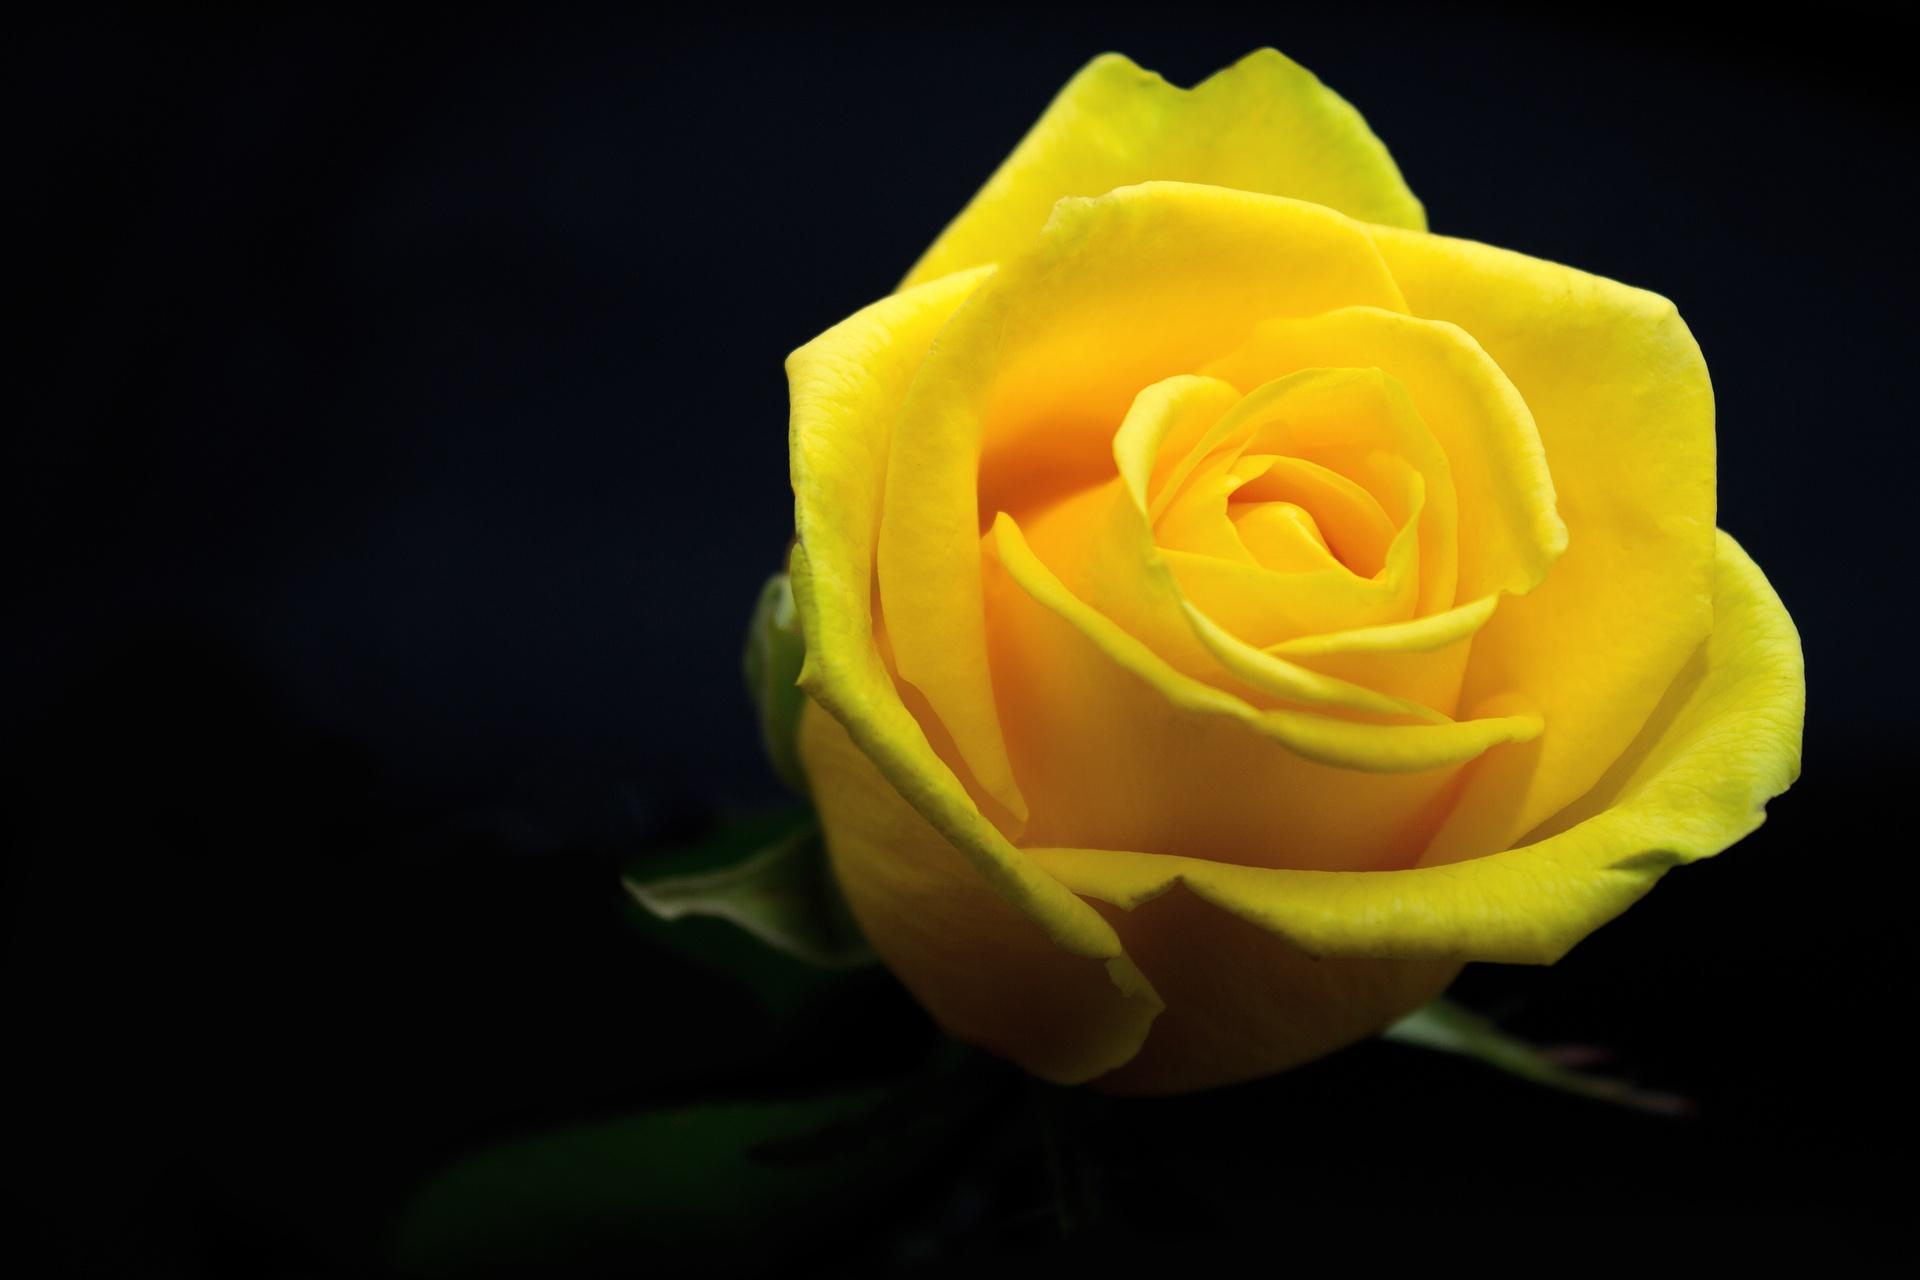 yellow love rose - HD1560×1040